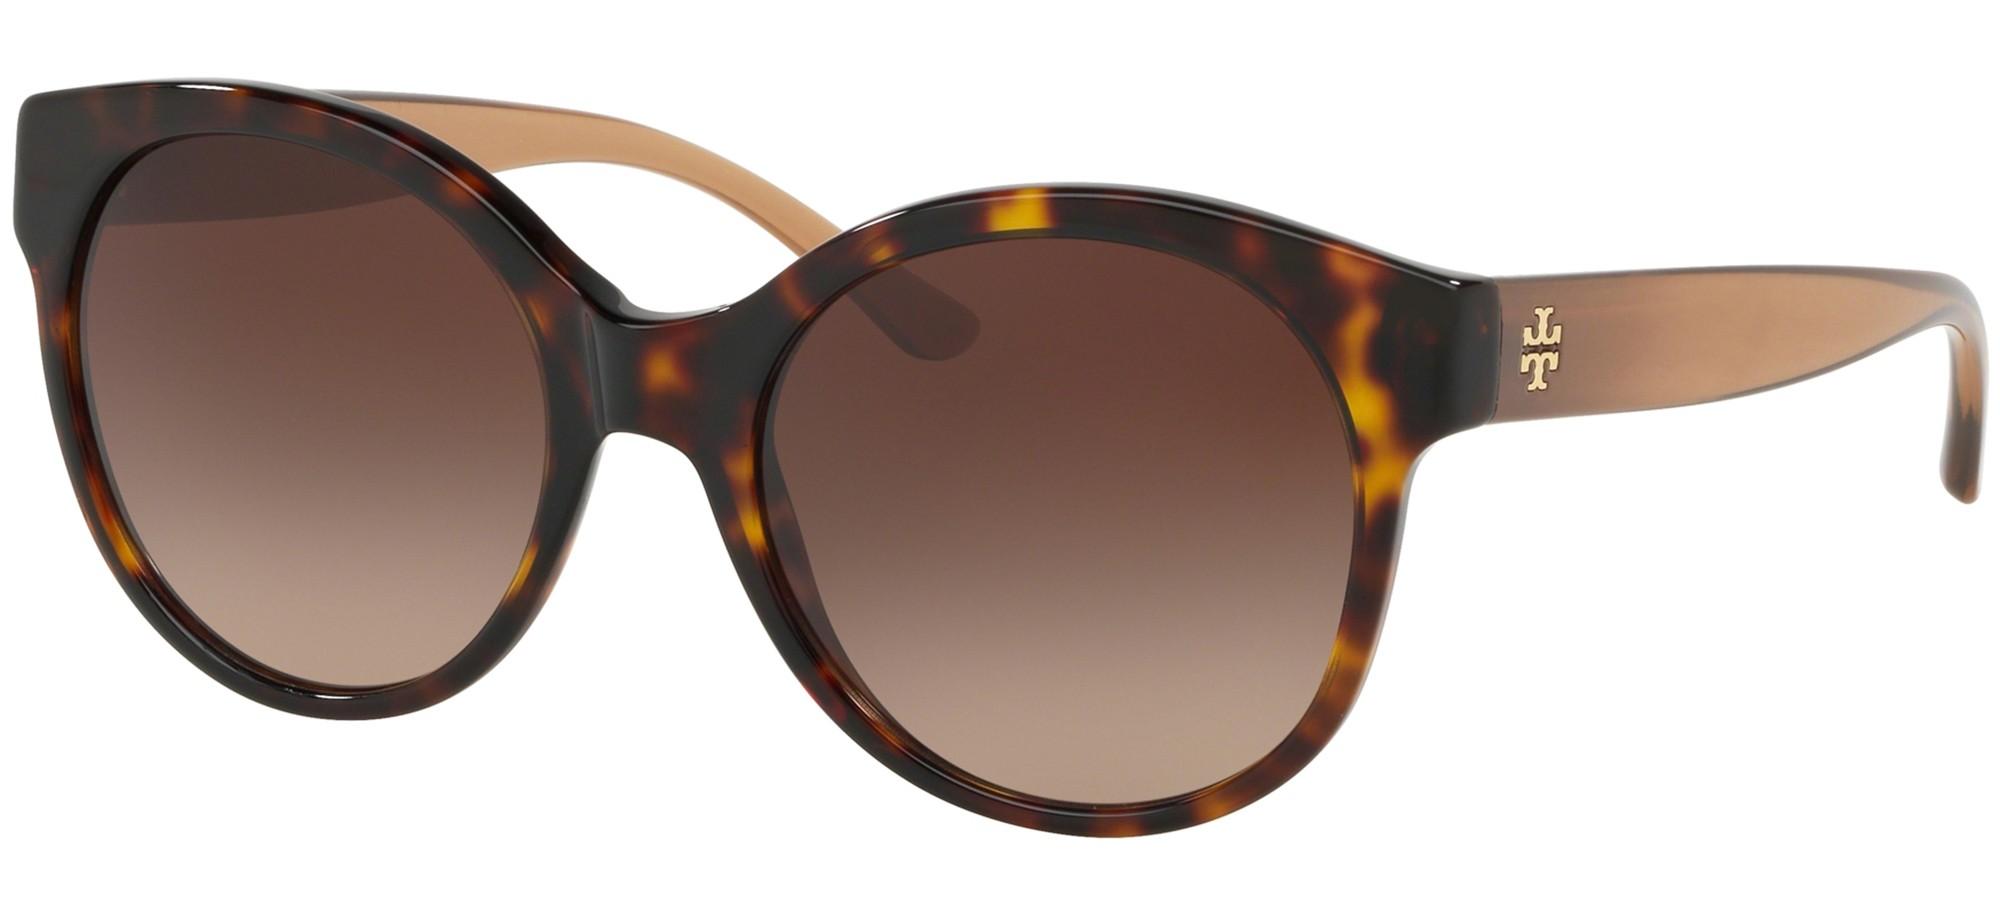 Tory Burch zonnebrillen TY 7123